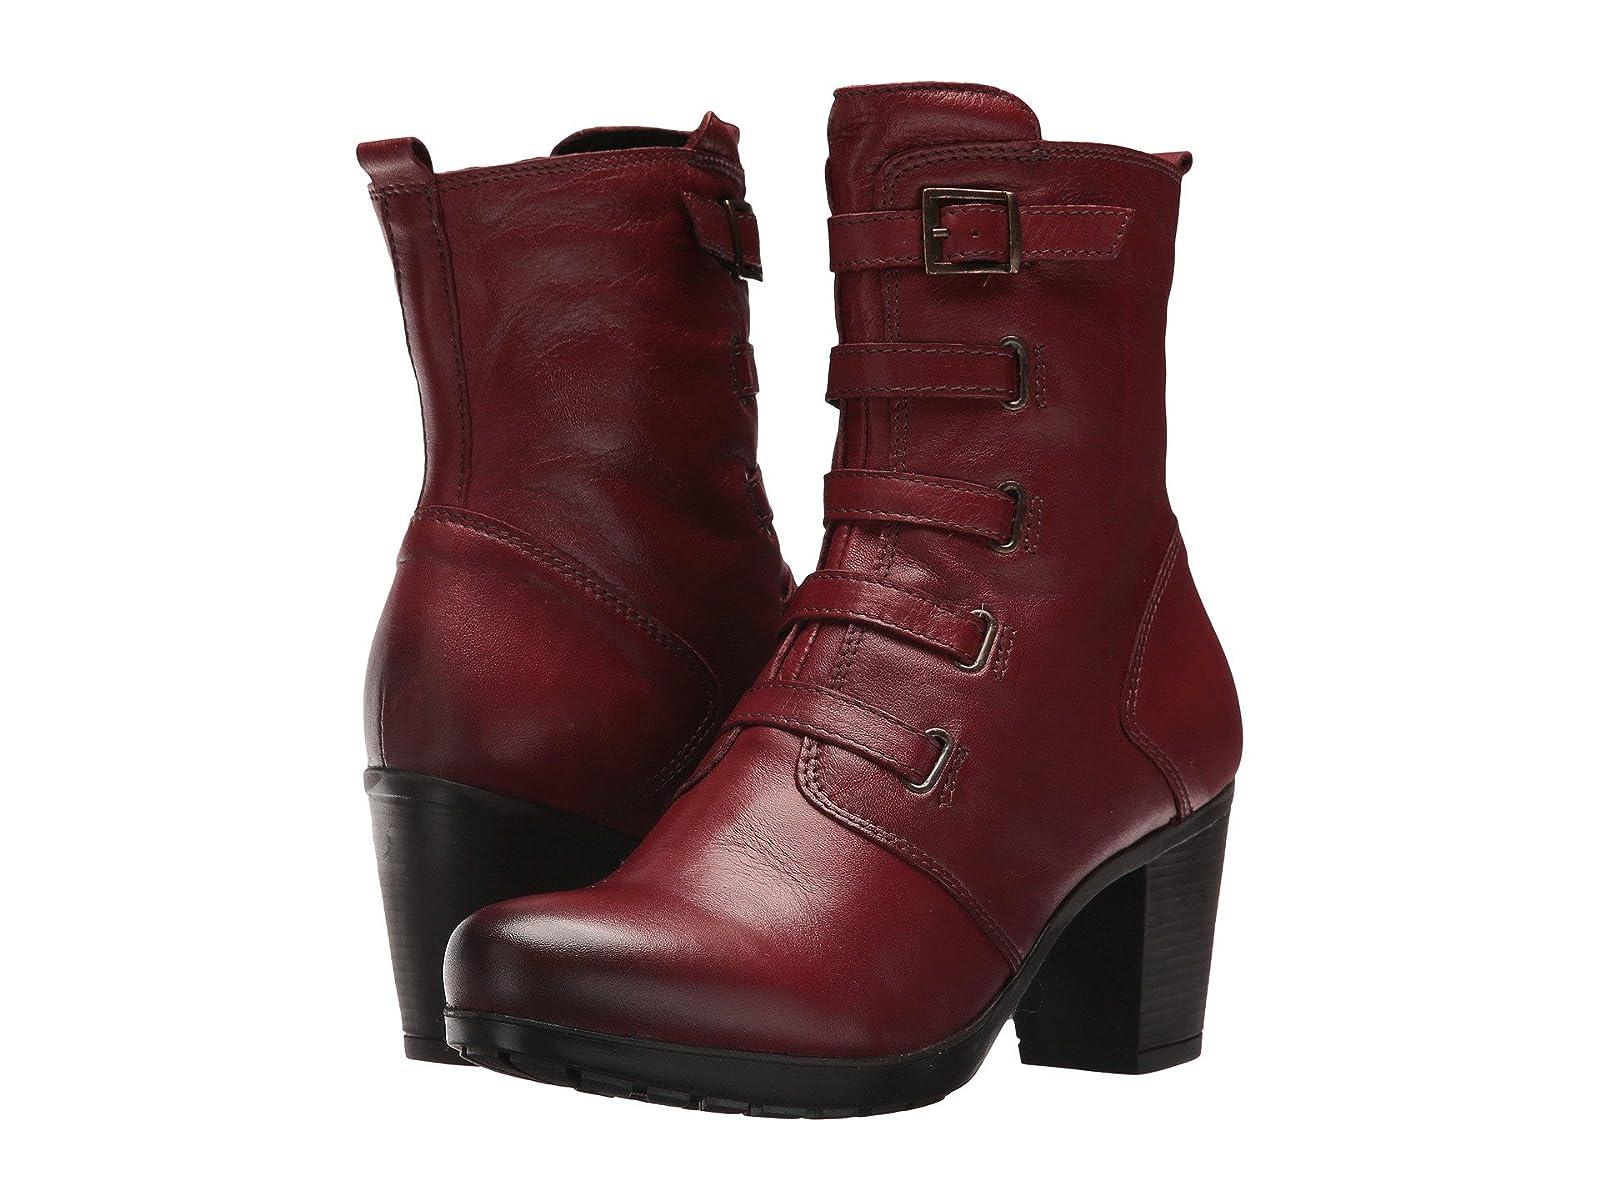 Eric Michael StefaniaCheap and distinctive eye-catching shoes